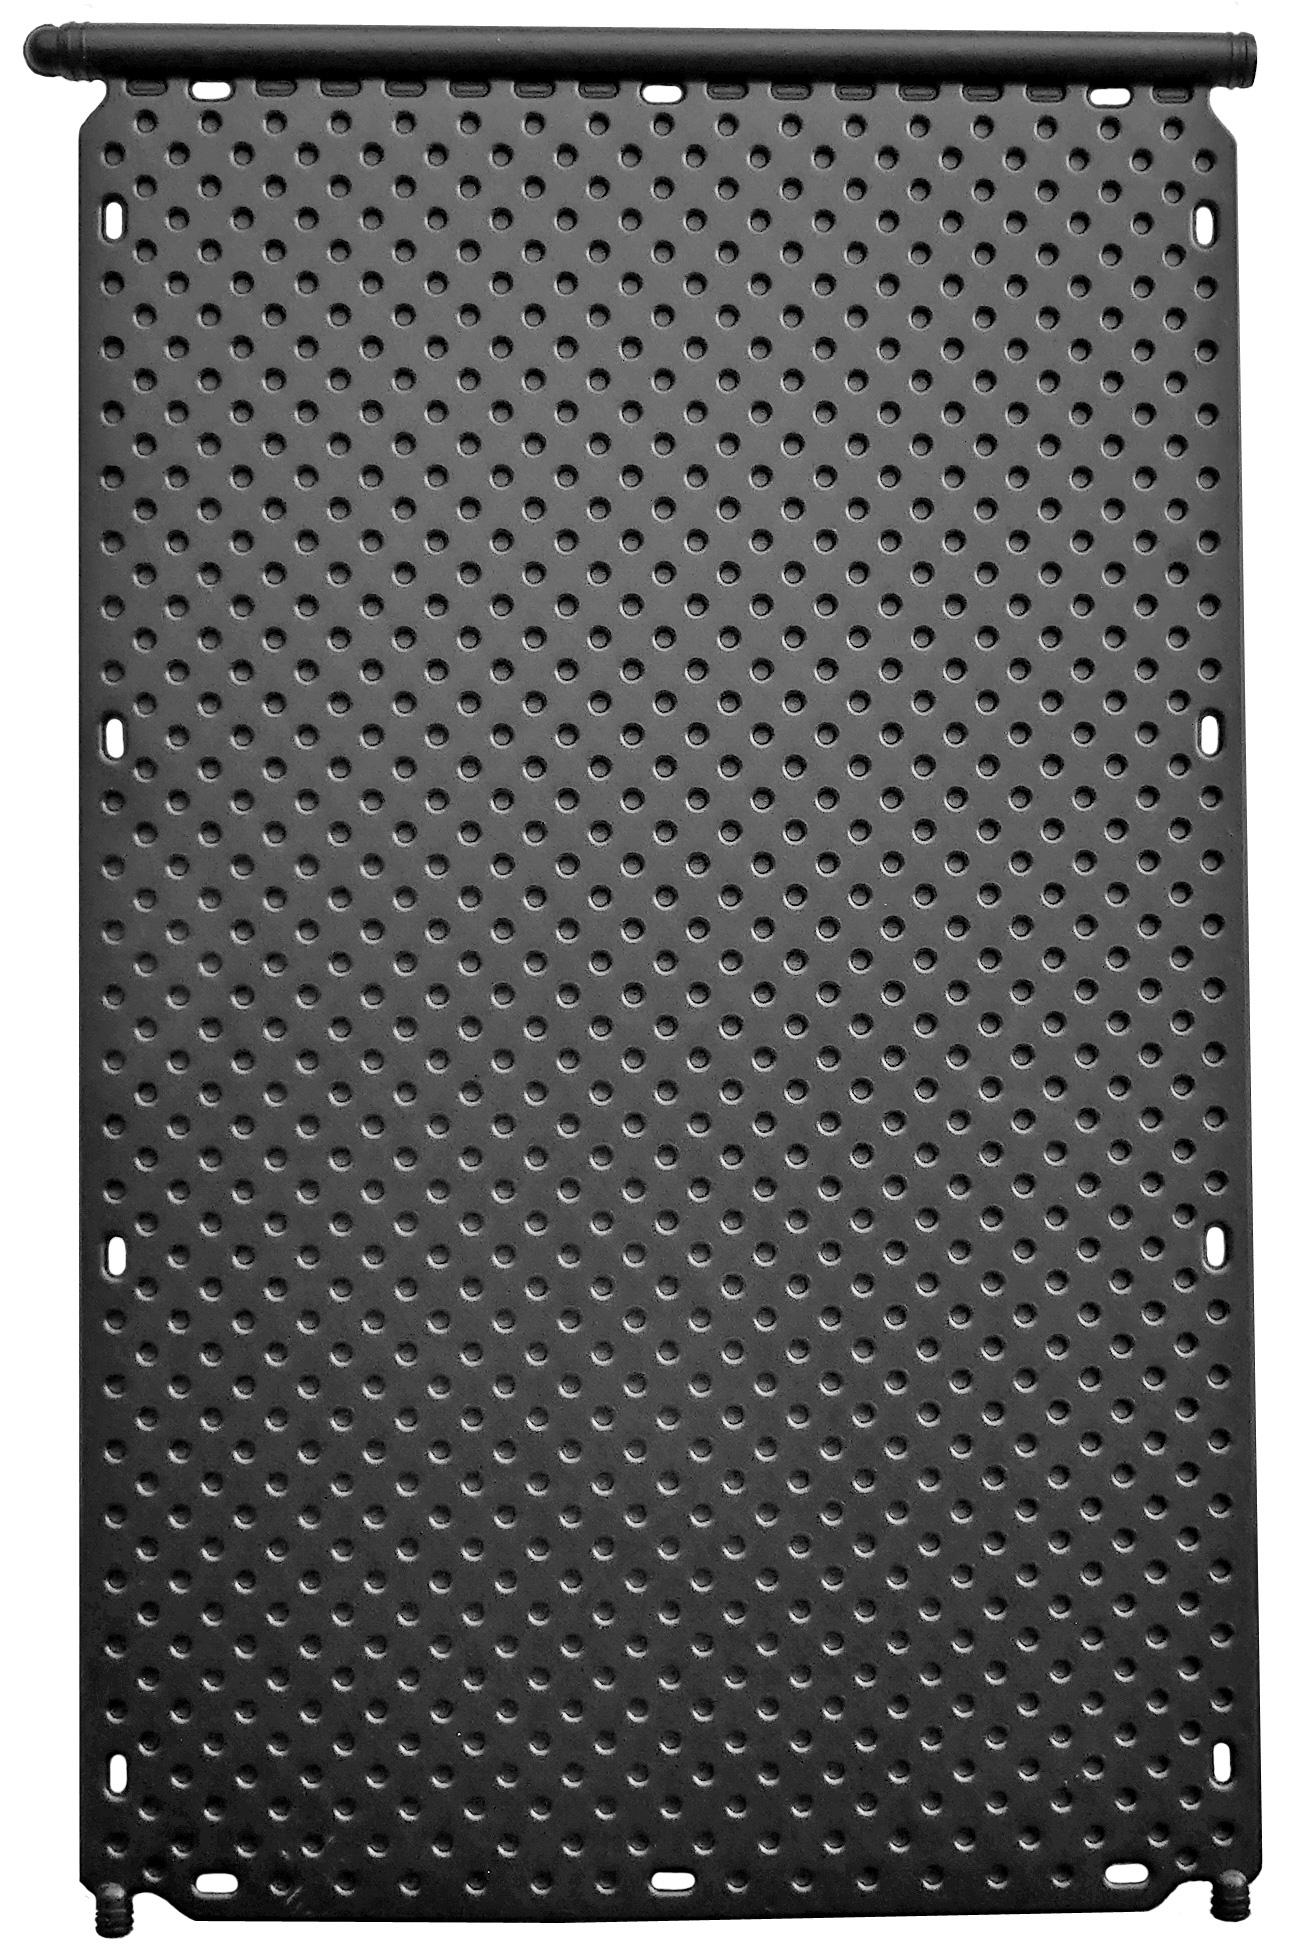 oku 1000 schwimmbad solarabsorber fkb schwimmbadtechnik. Black Bedroom Furniture Sets. Home Design Ideas